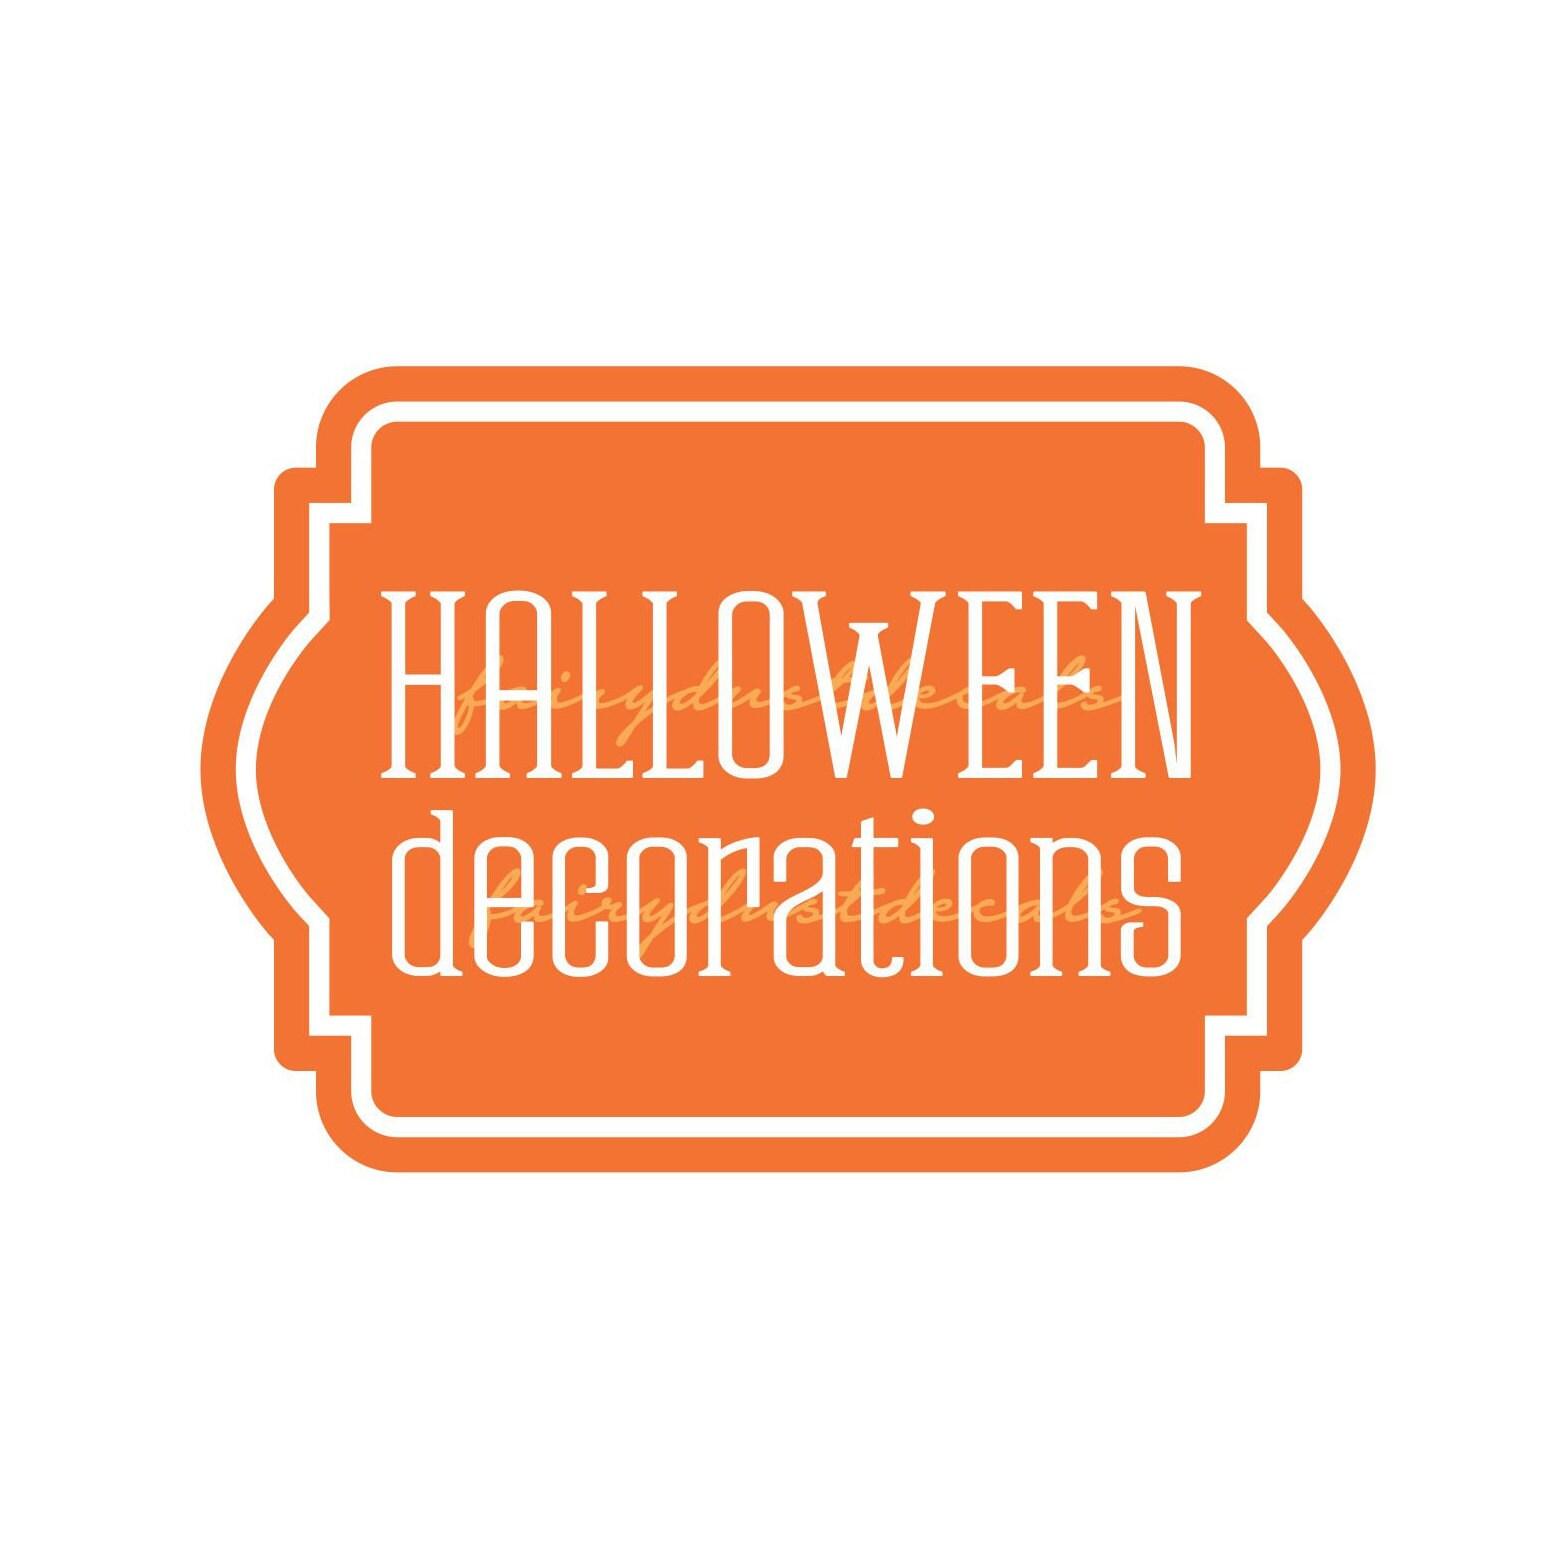 halloween decorations storage label, plastic tote vinyl decal